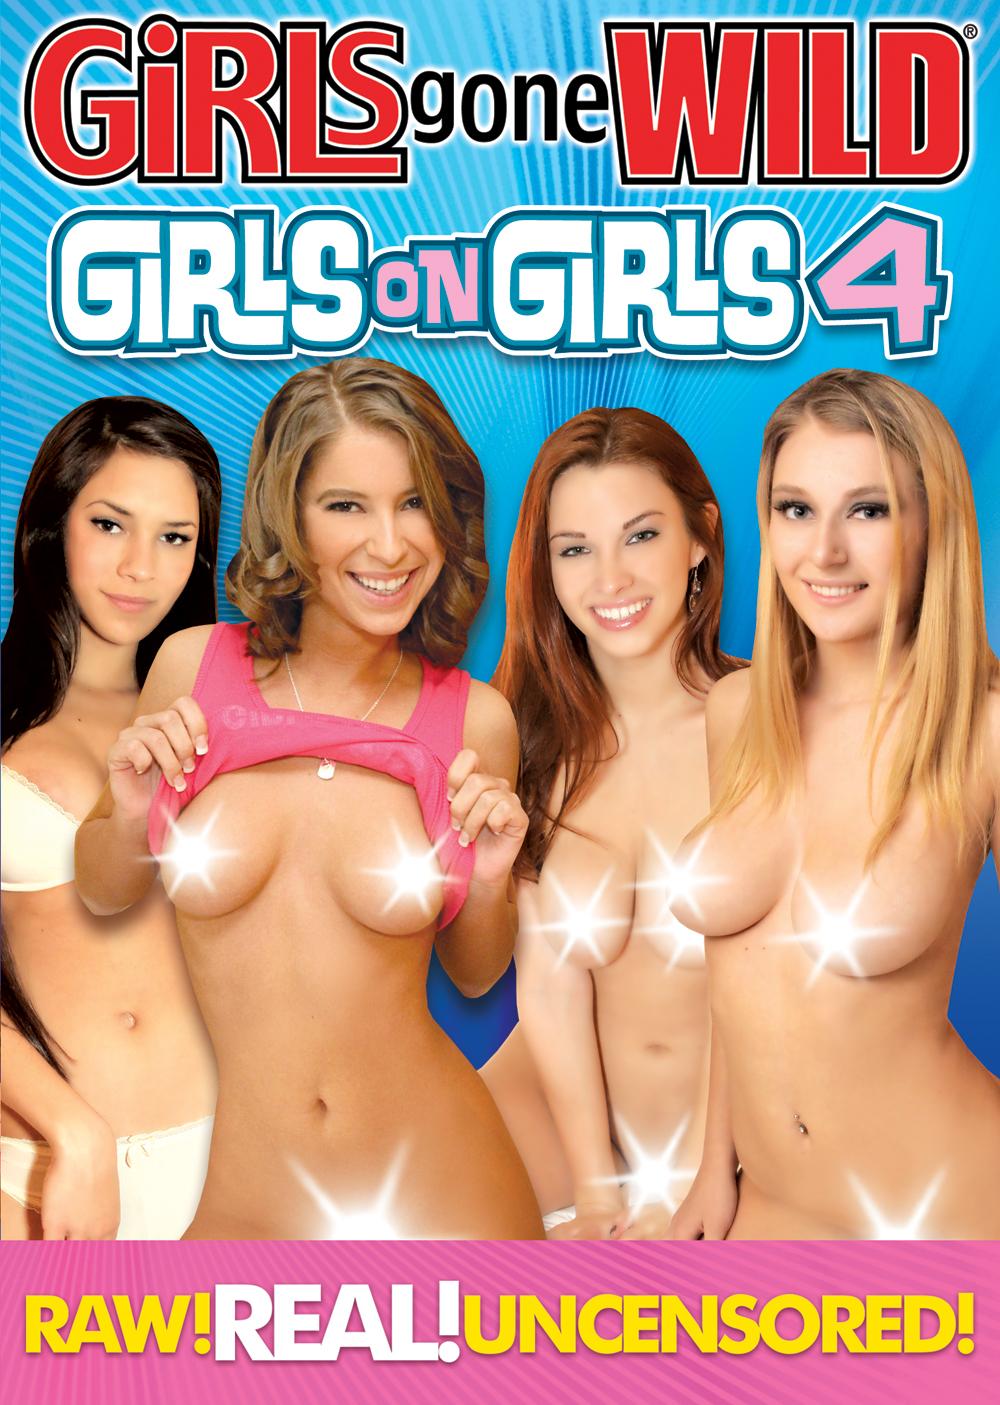 Girls Gone Wild: Girls on Girls, Vol. 4